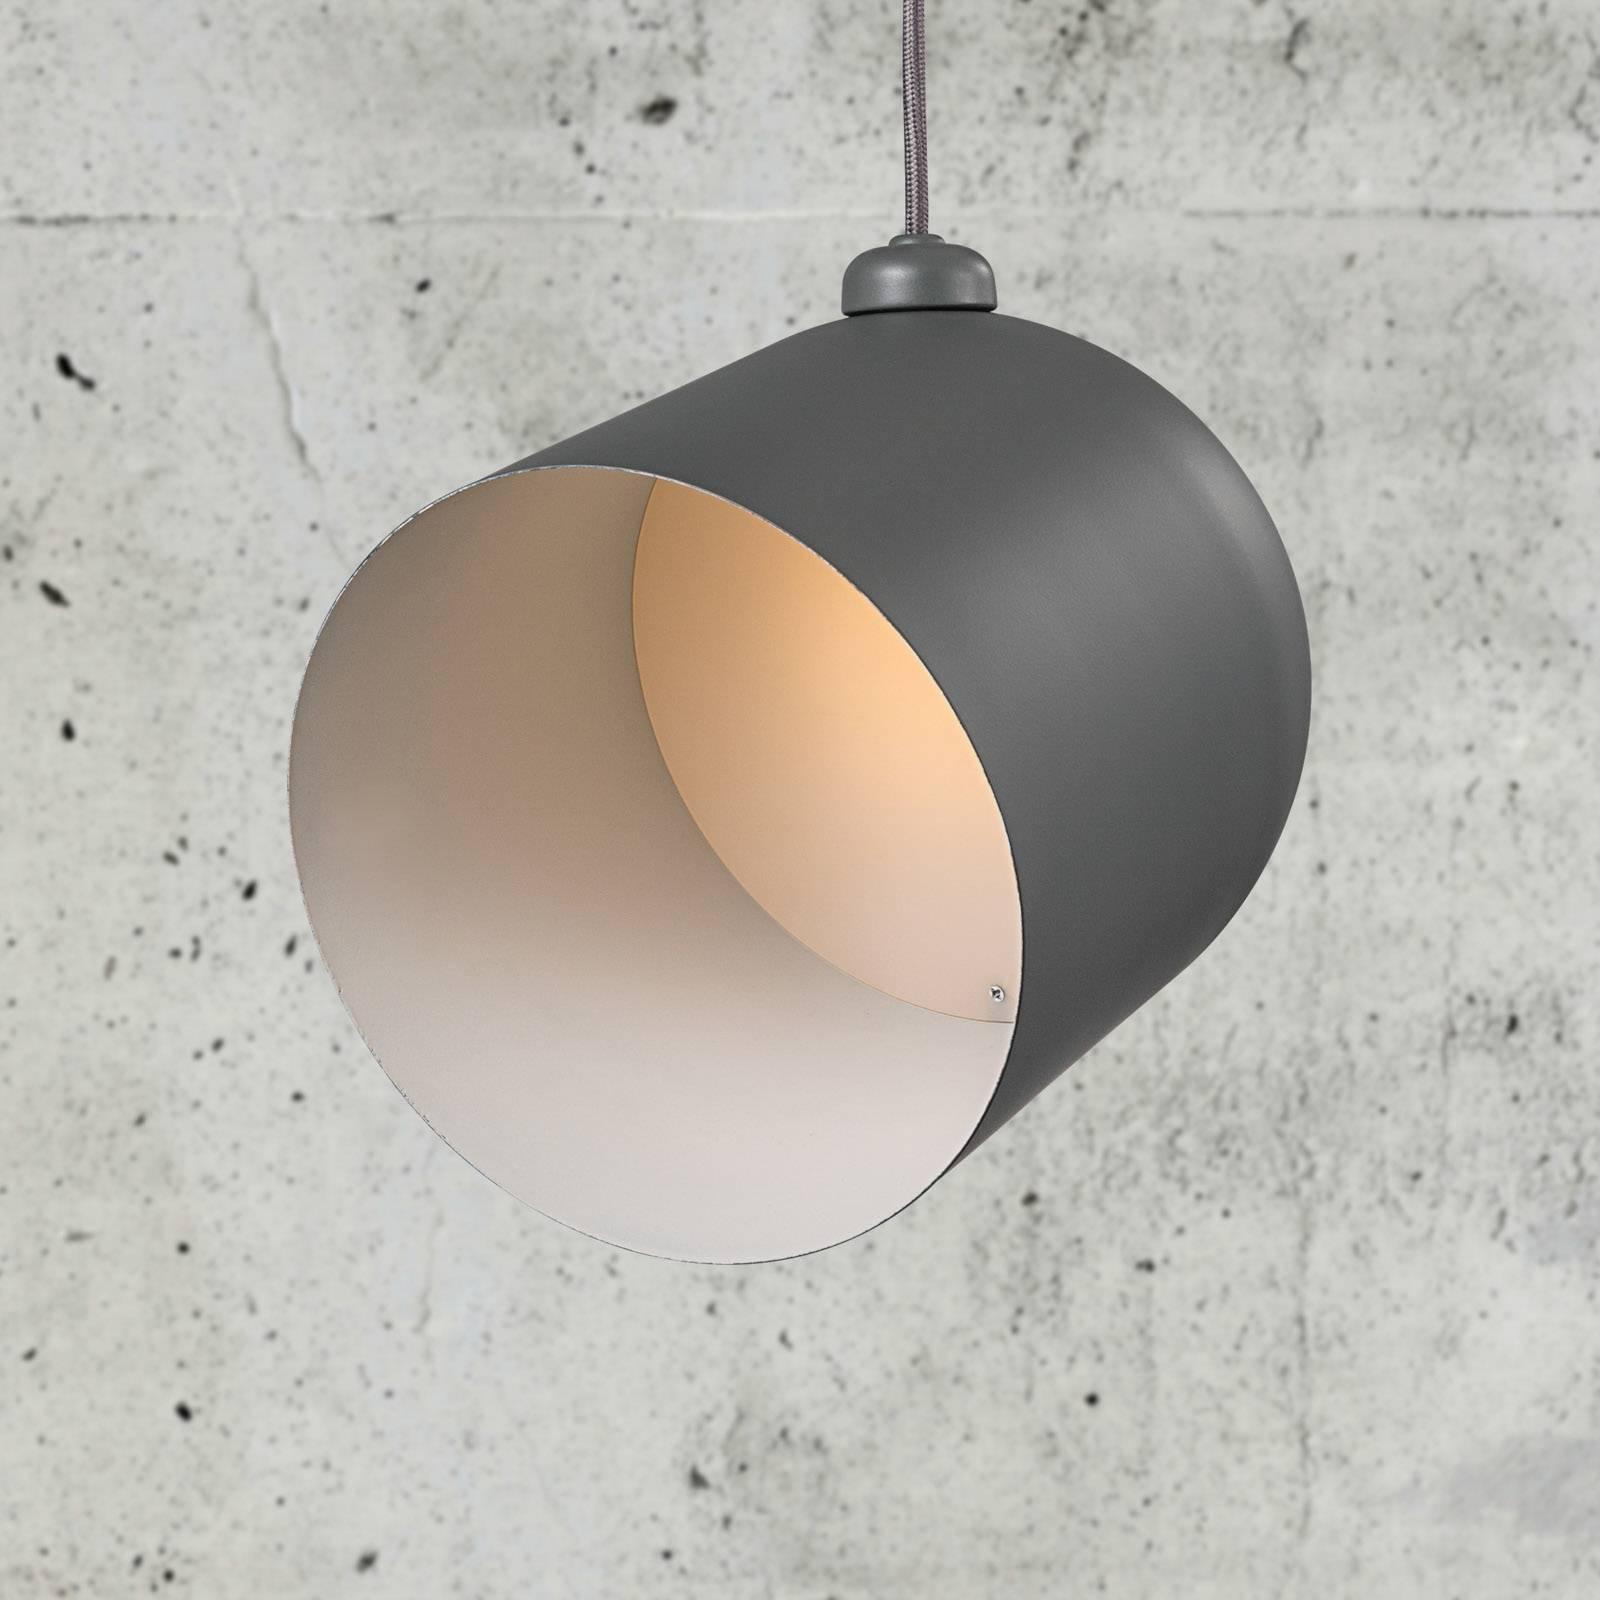 LED-riippuvalaisin Angle, harmaa